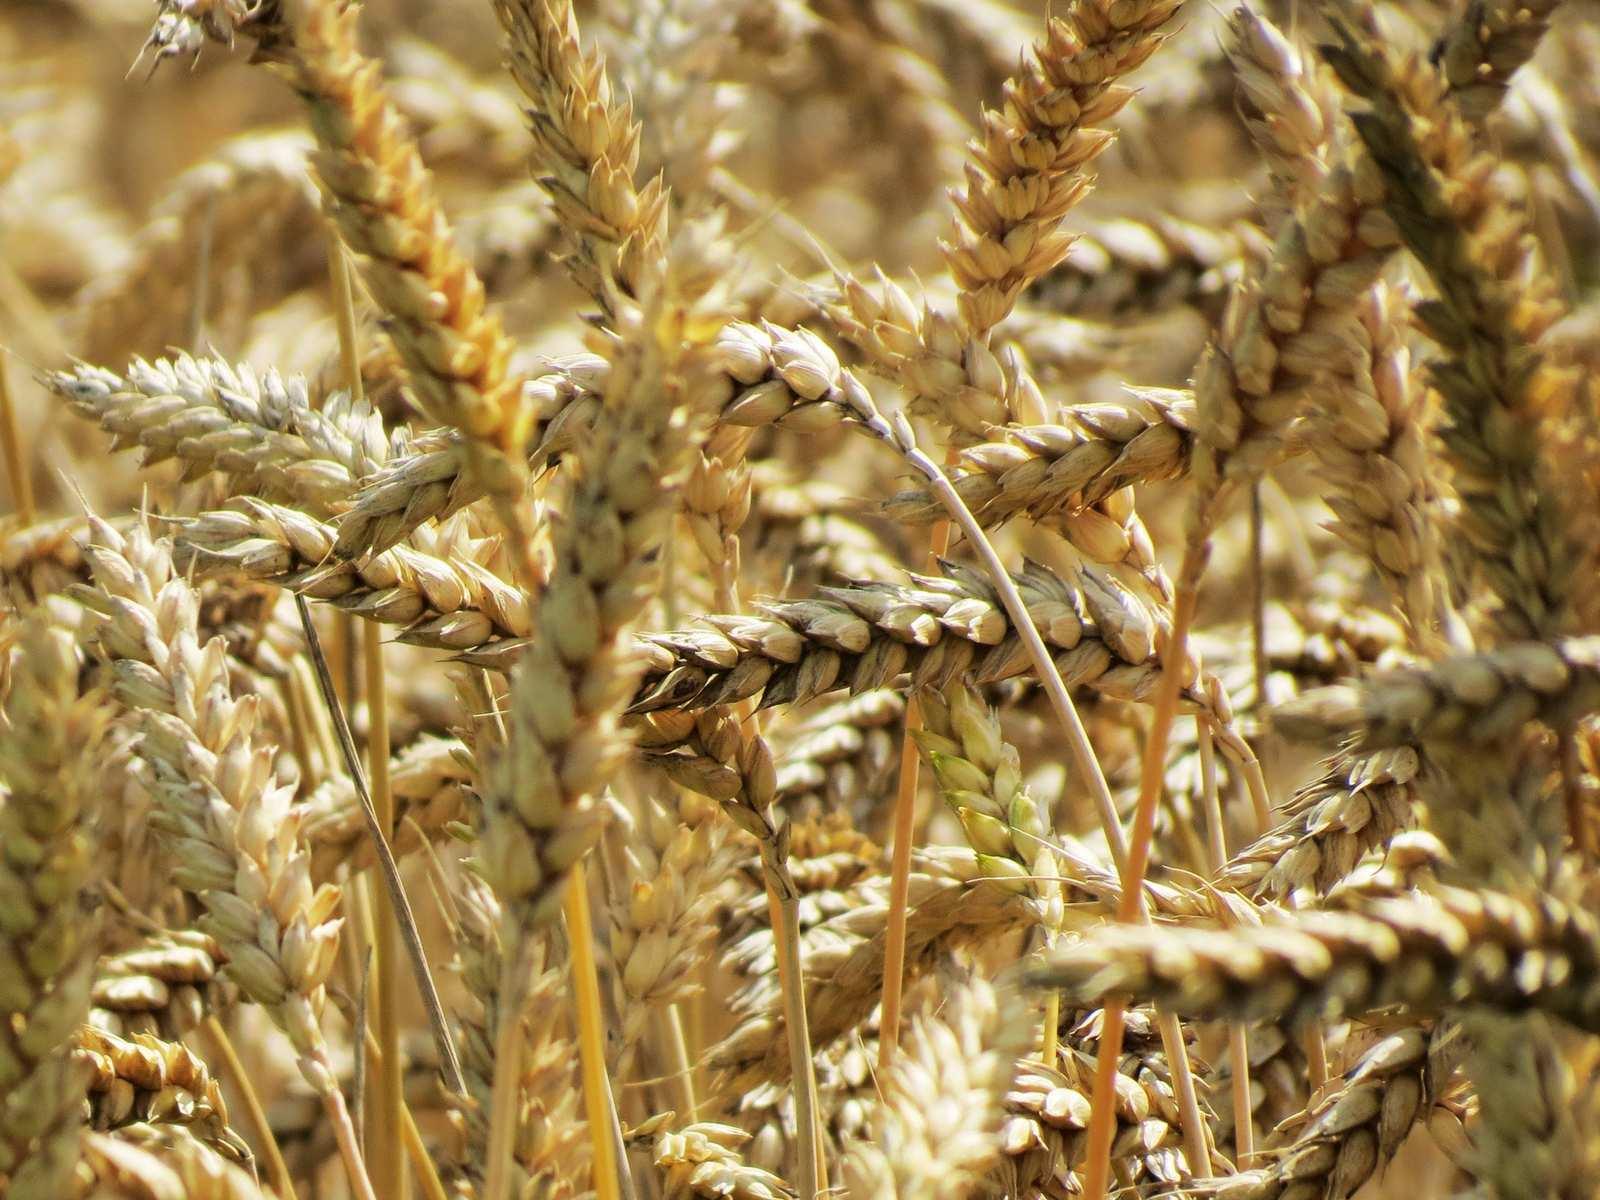 Curs Managementul exploatatiilor agricole – Curs Viitor